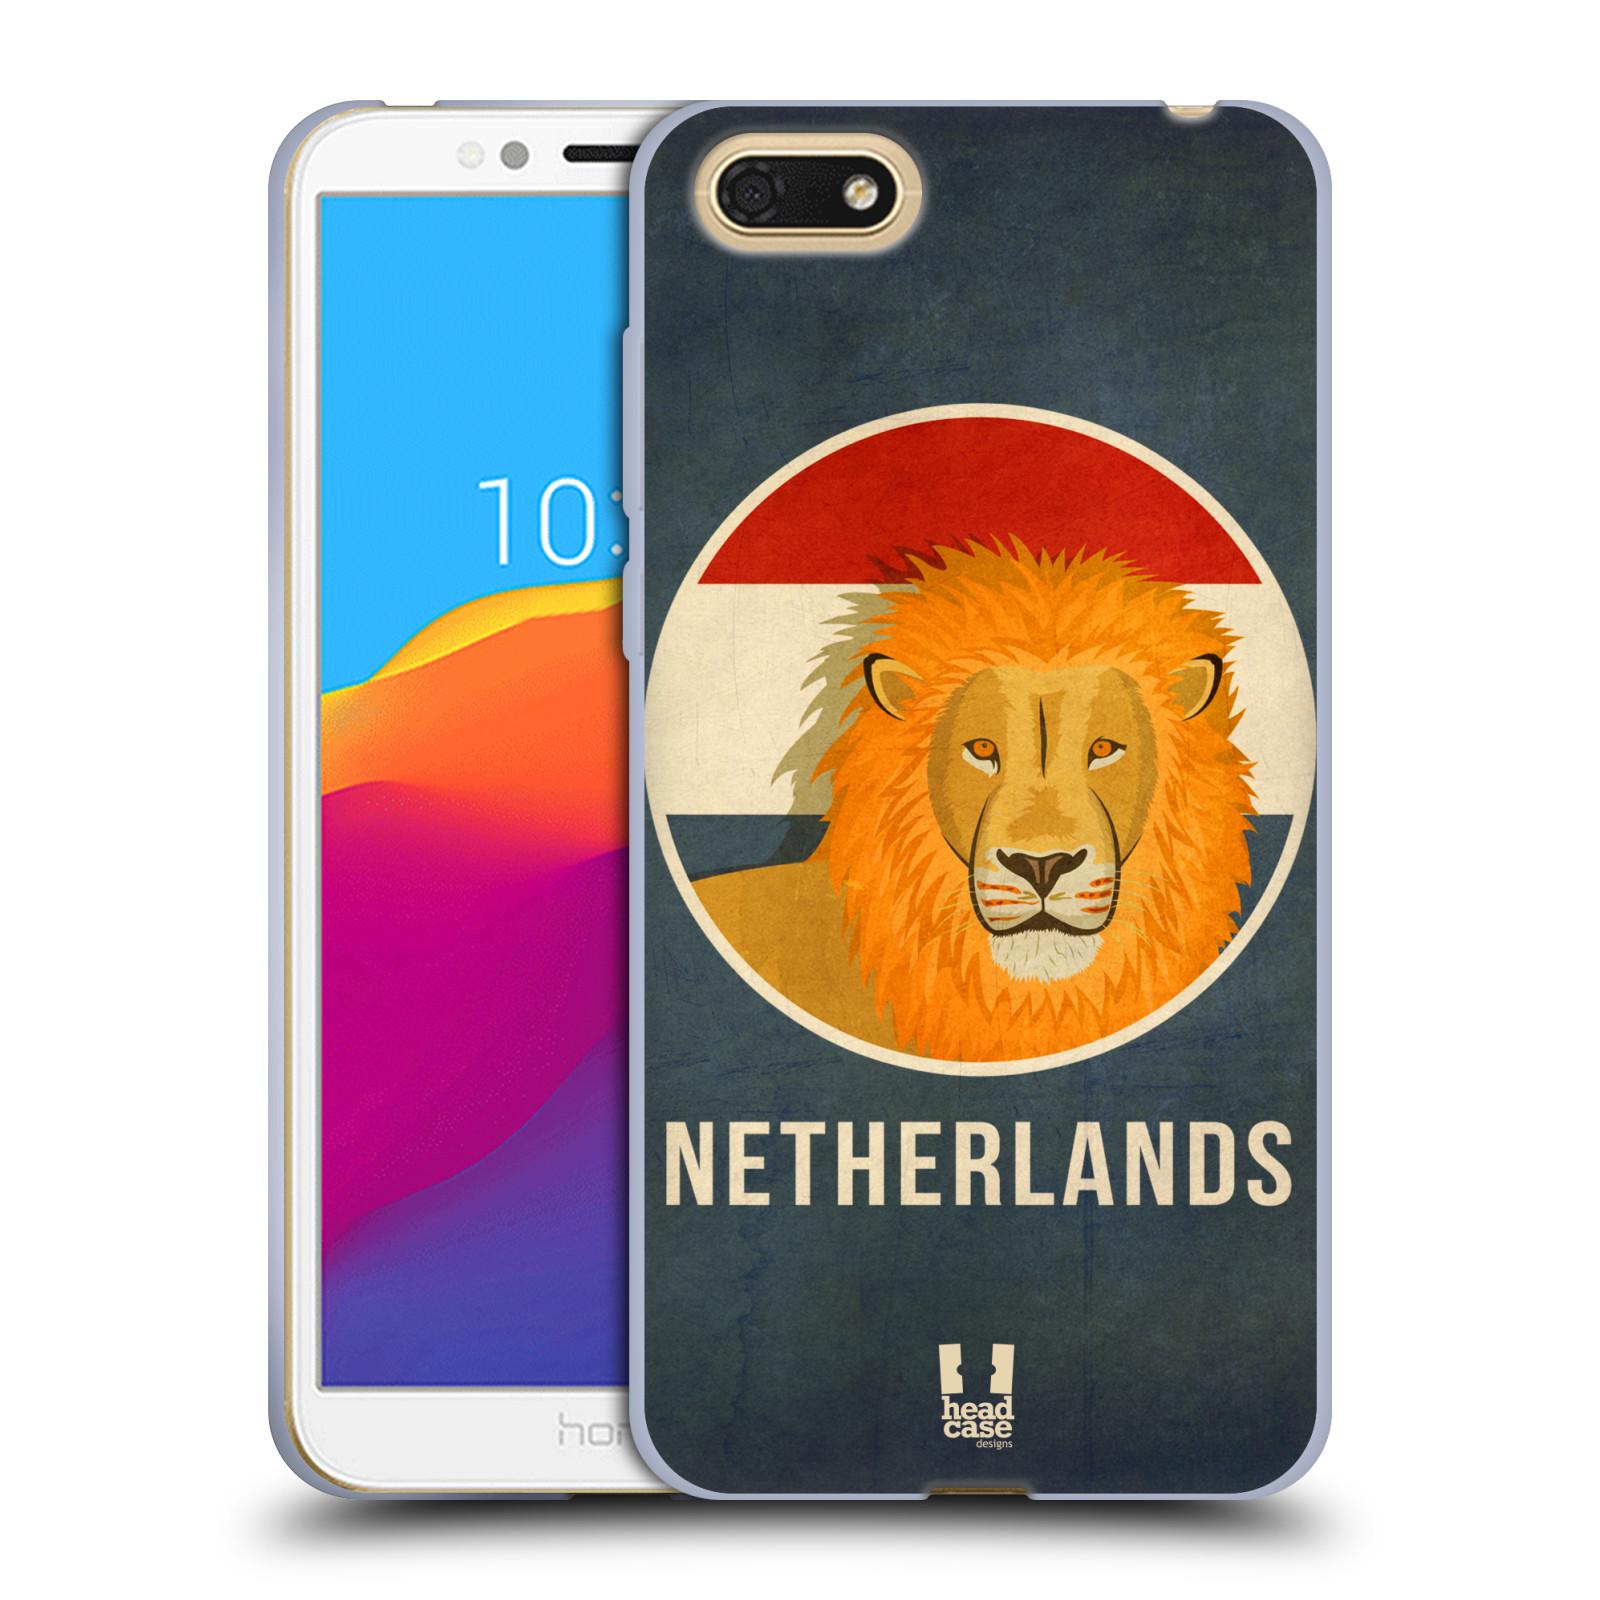 HEAD CASE silikonový obal na mobil Honor 7S vzor Patriotismus zvíře symbol HOLANDSKO LEV